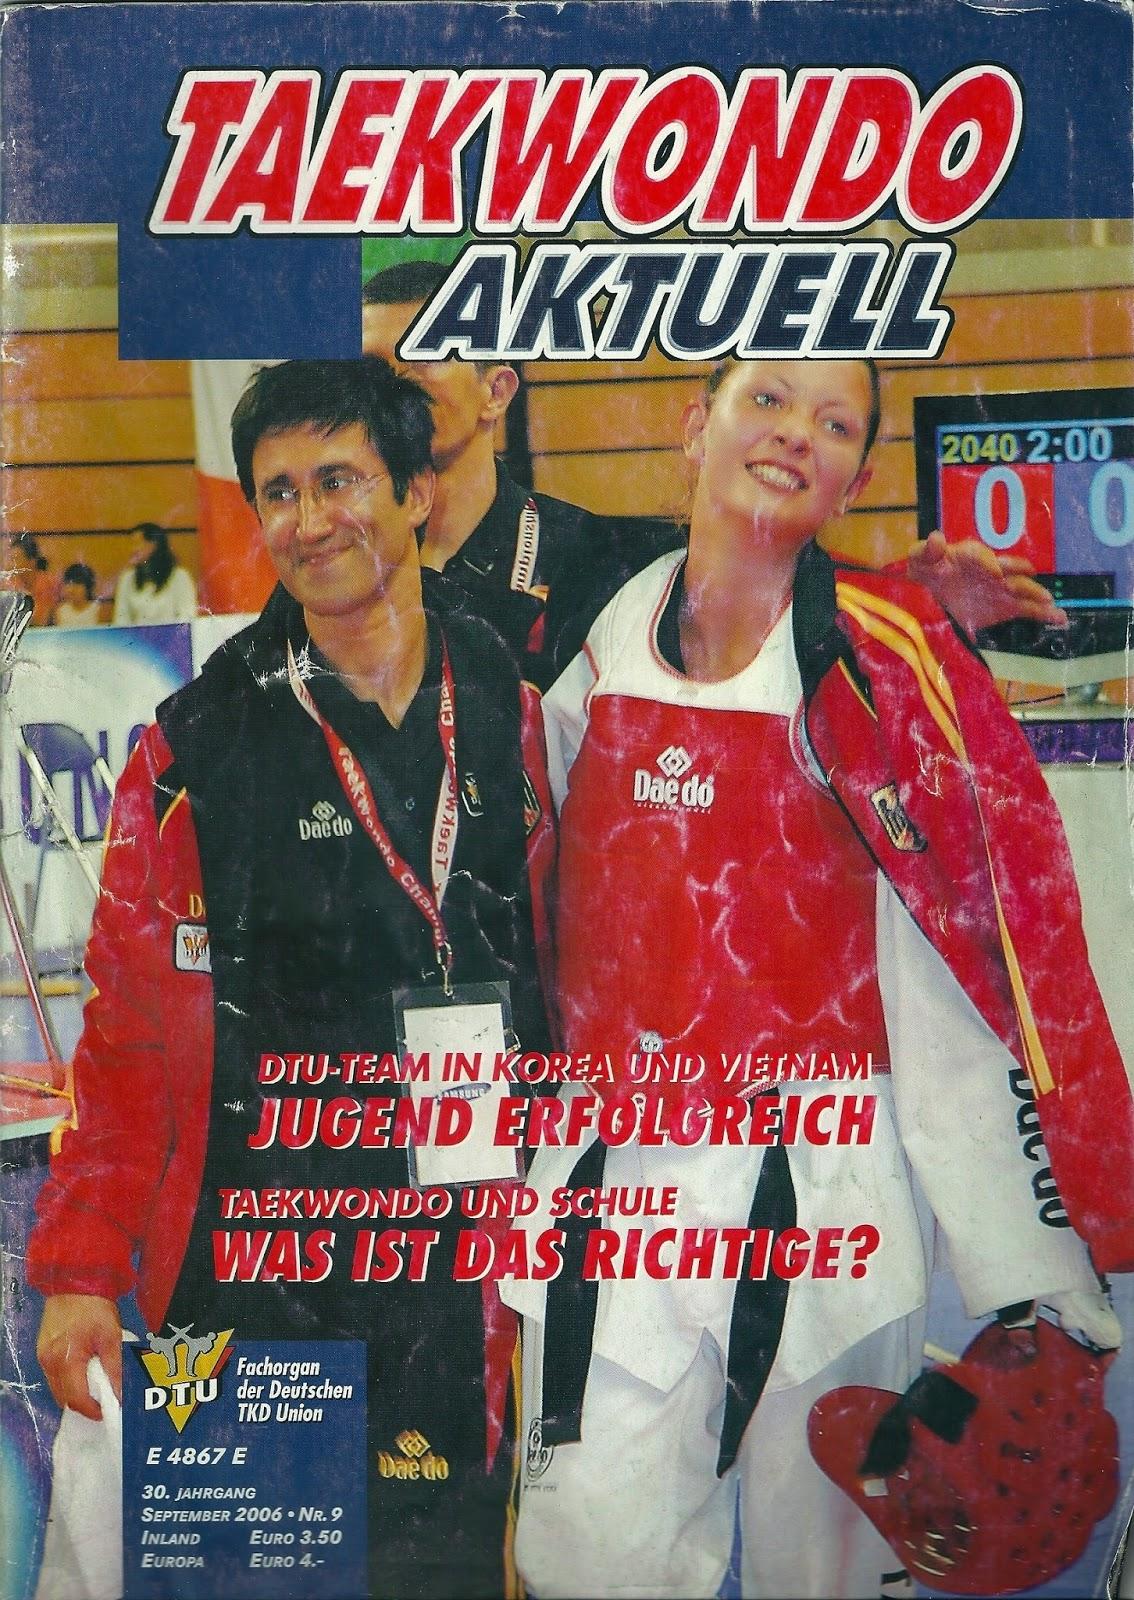 Gimnasio han kuk hapkido taekwondo art culo prensa for Gimnasio telde